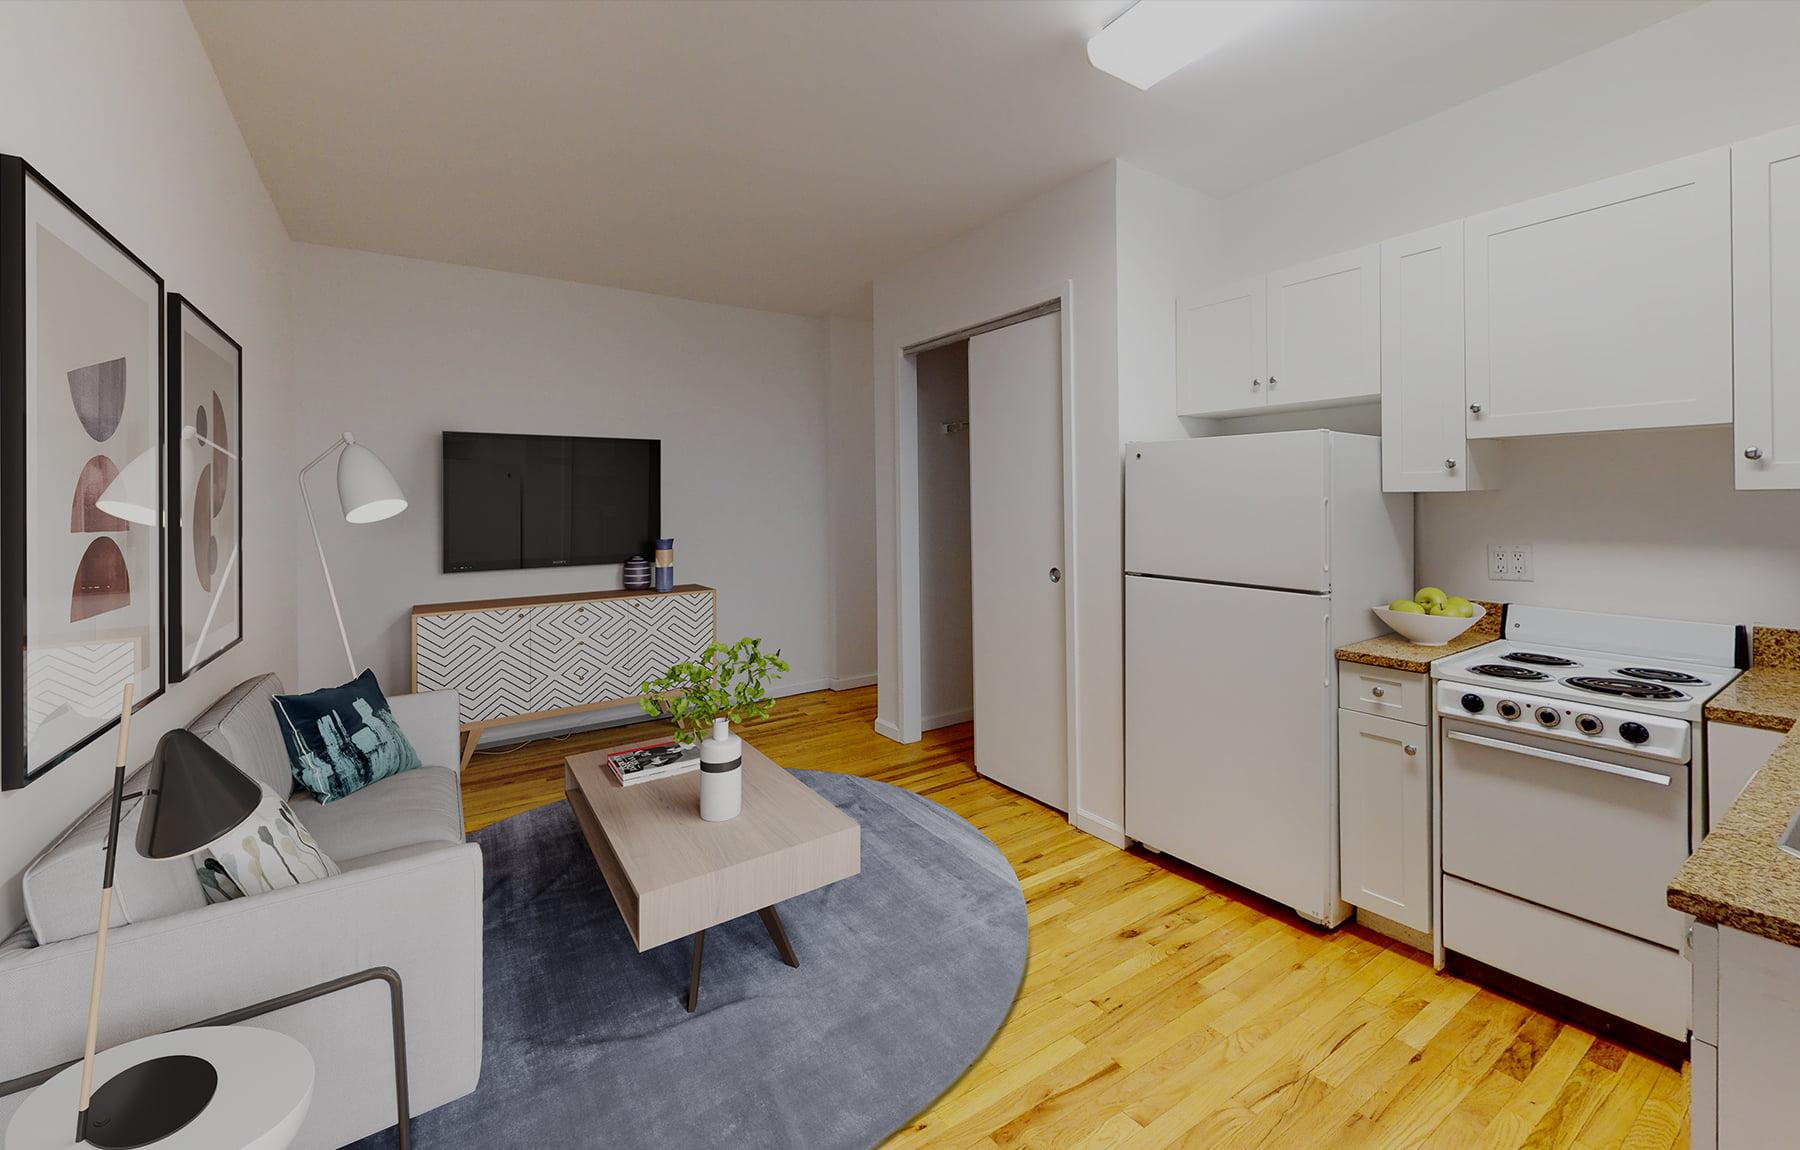 Eurostyle Kitchen Cabinetry